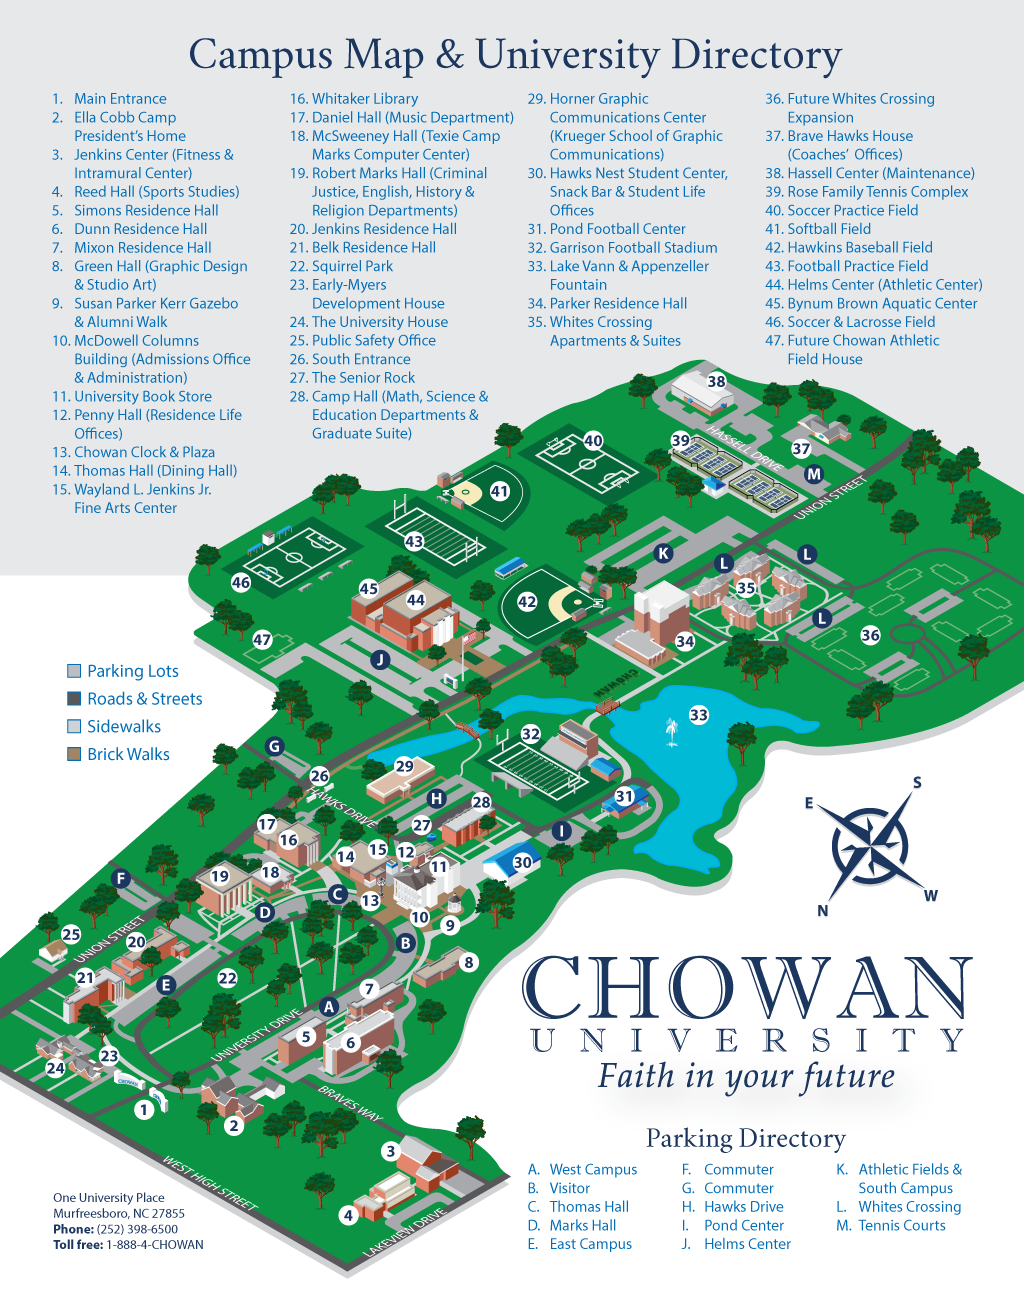 Chowan University Campus Map.Chowan University 2015